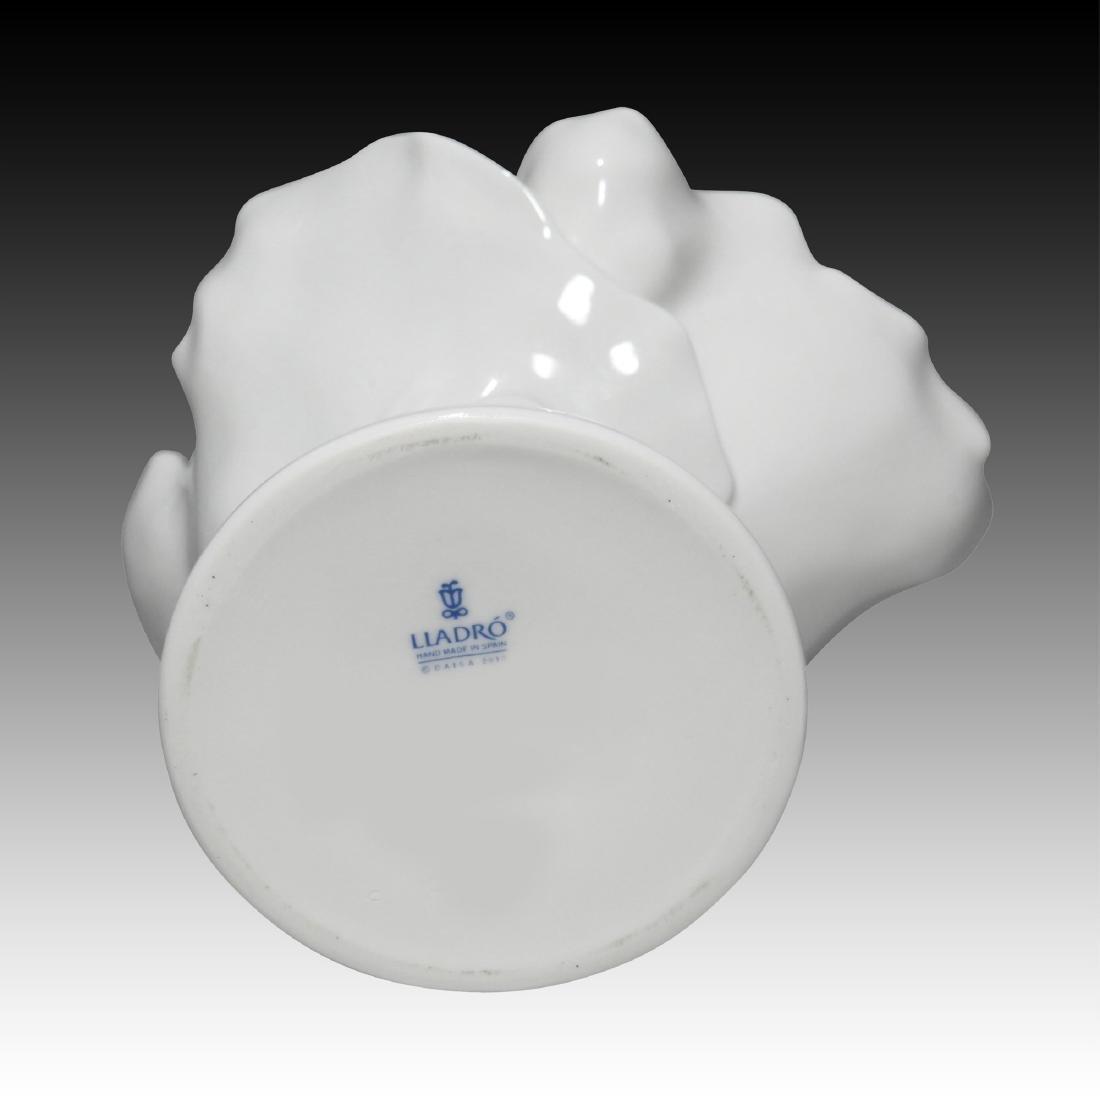 LLADRO NATUROFANTASTIC WHITE COCKTAIL GOBLET - 3